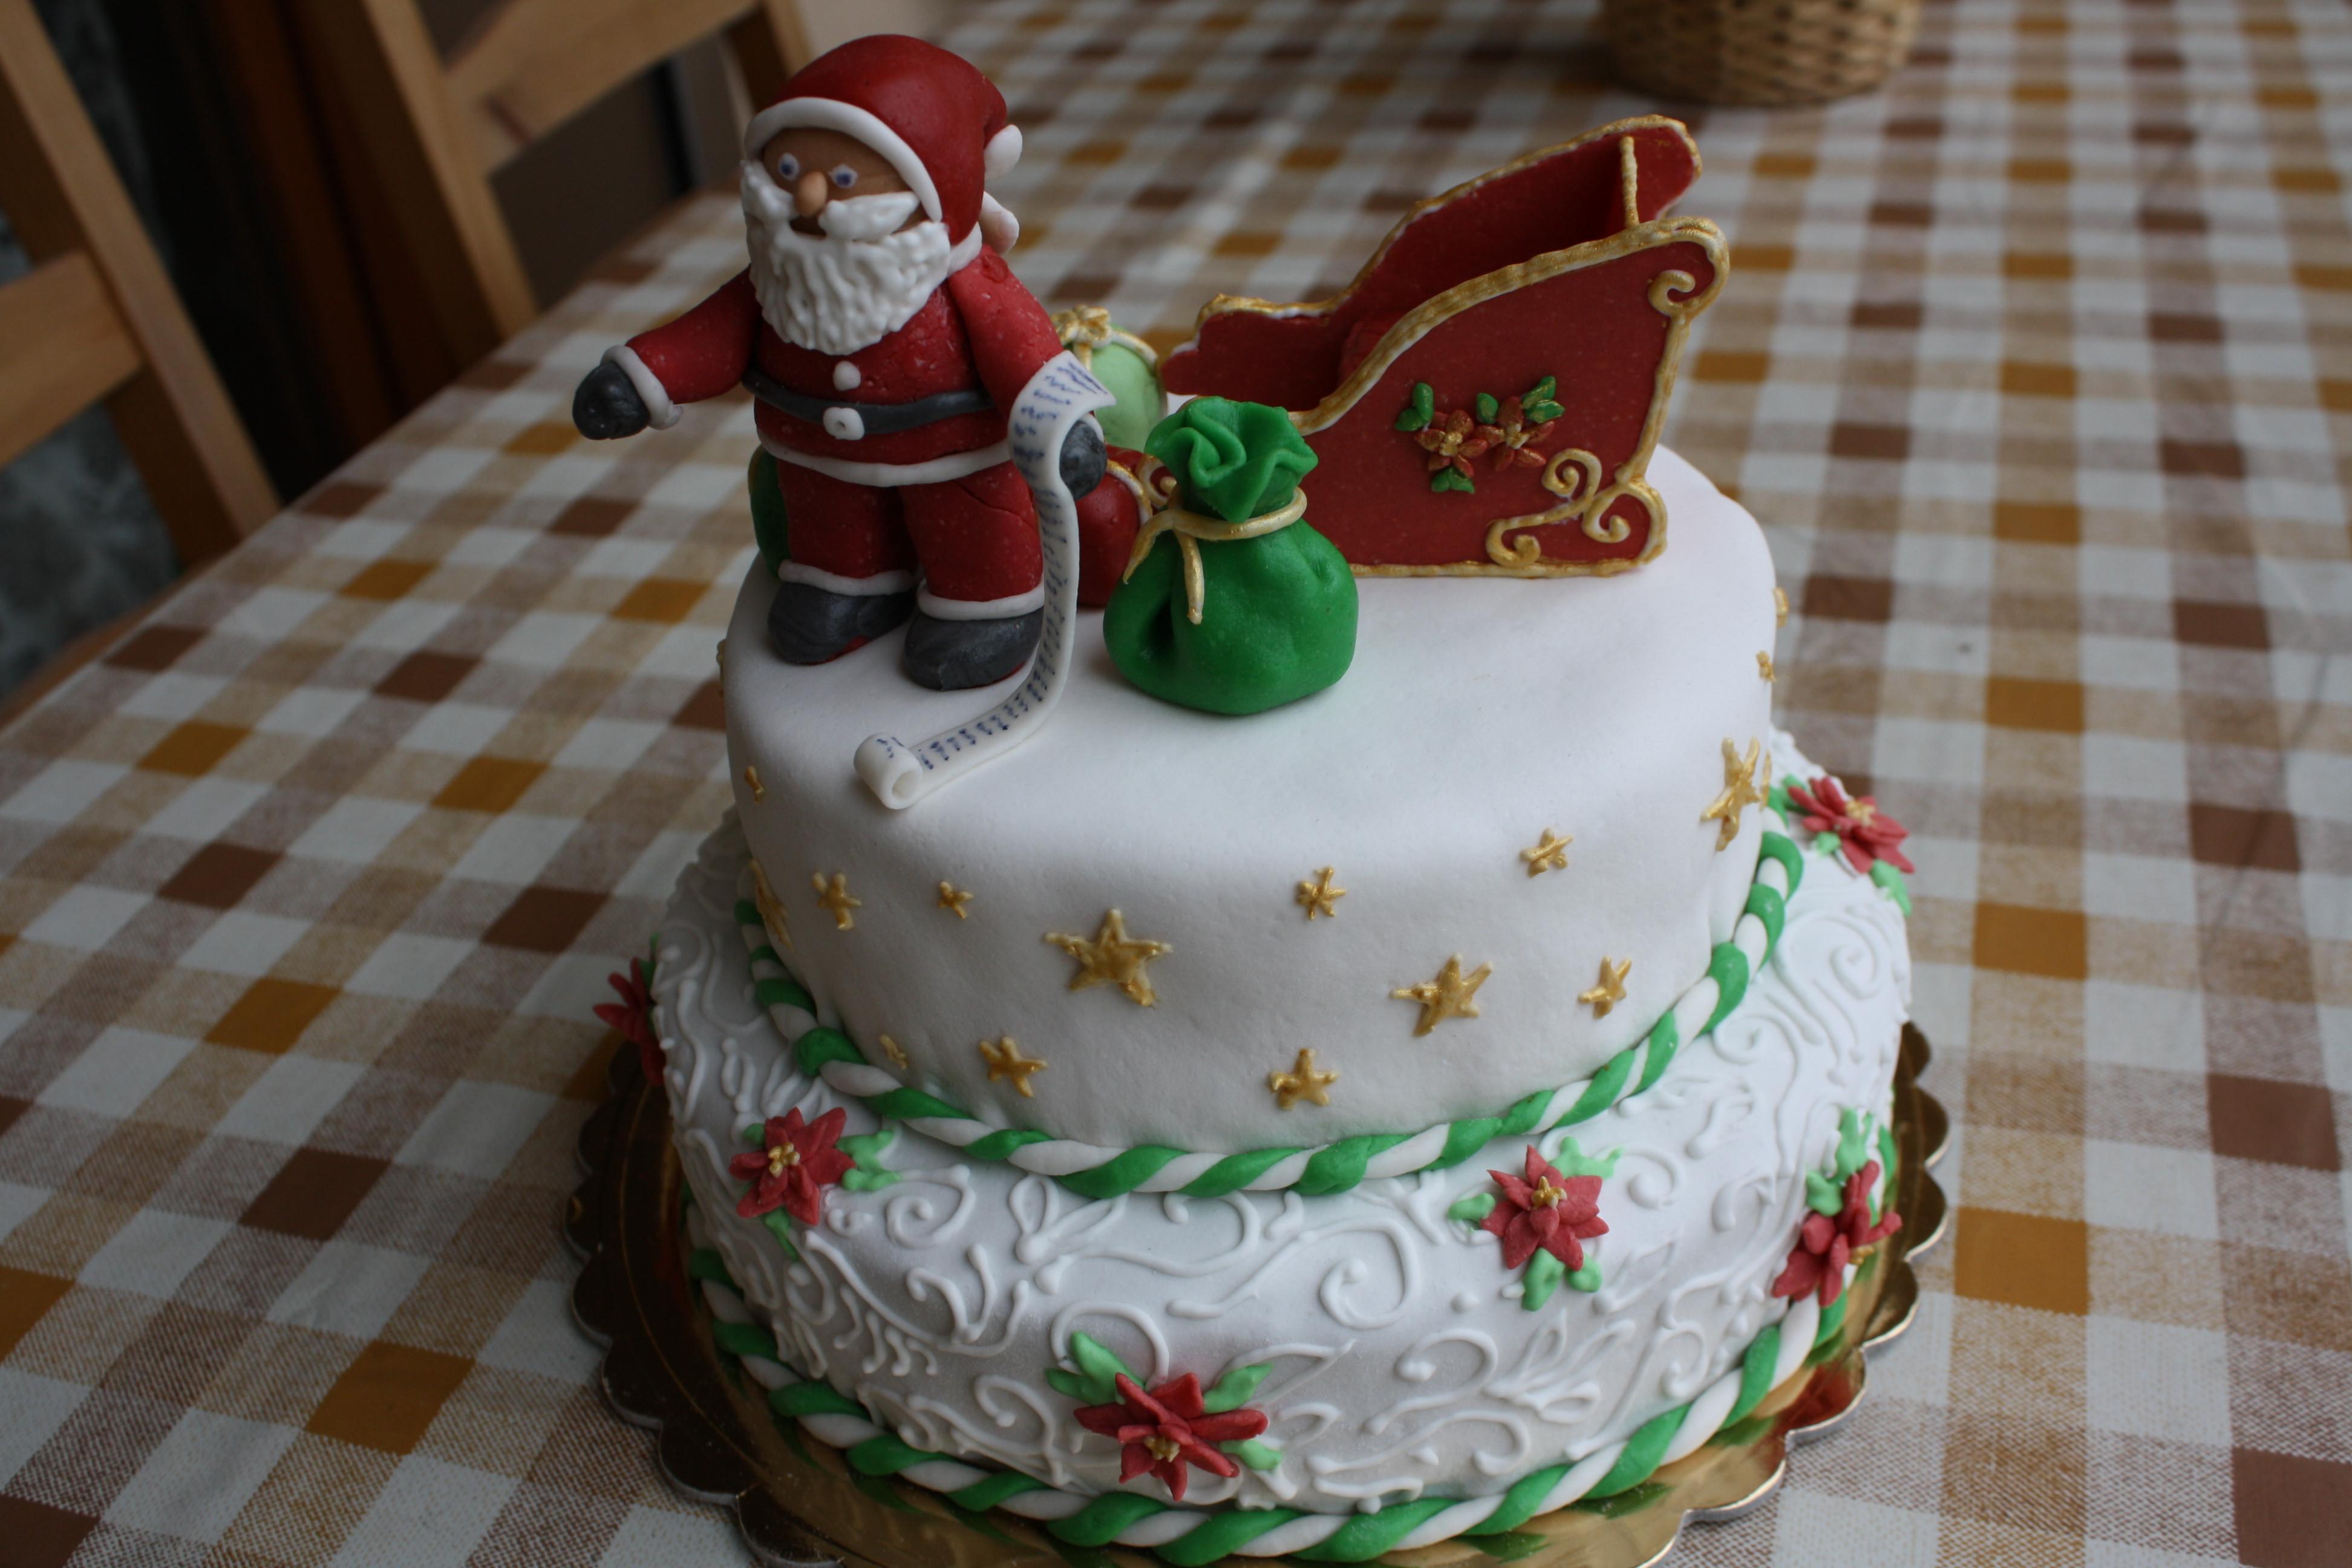 Buttercream Christmas Cakes  Christmas Cake – Santa delivering christmas ts on his